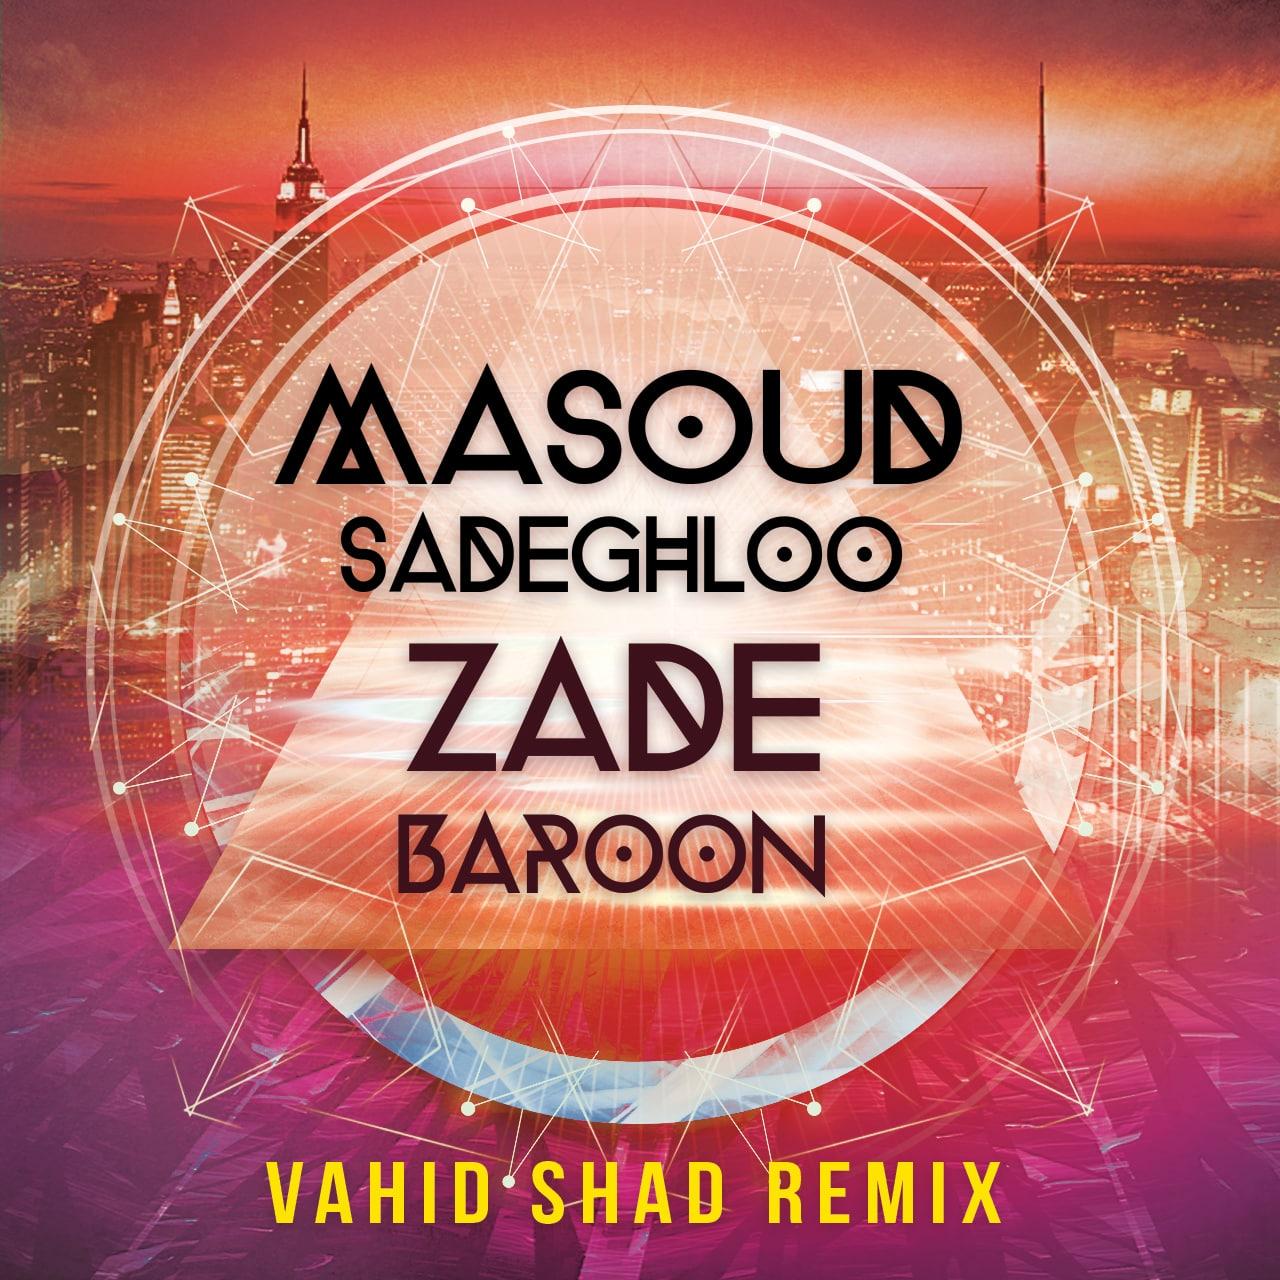 Masoud Sadeghloo - Zade Baroon (Vahid Shad Remix)